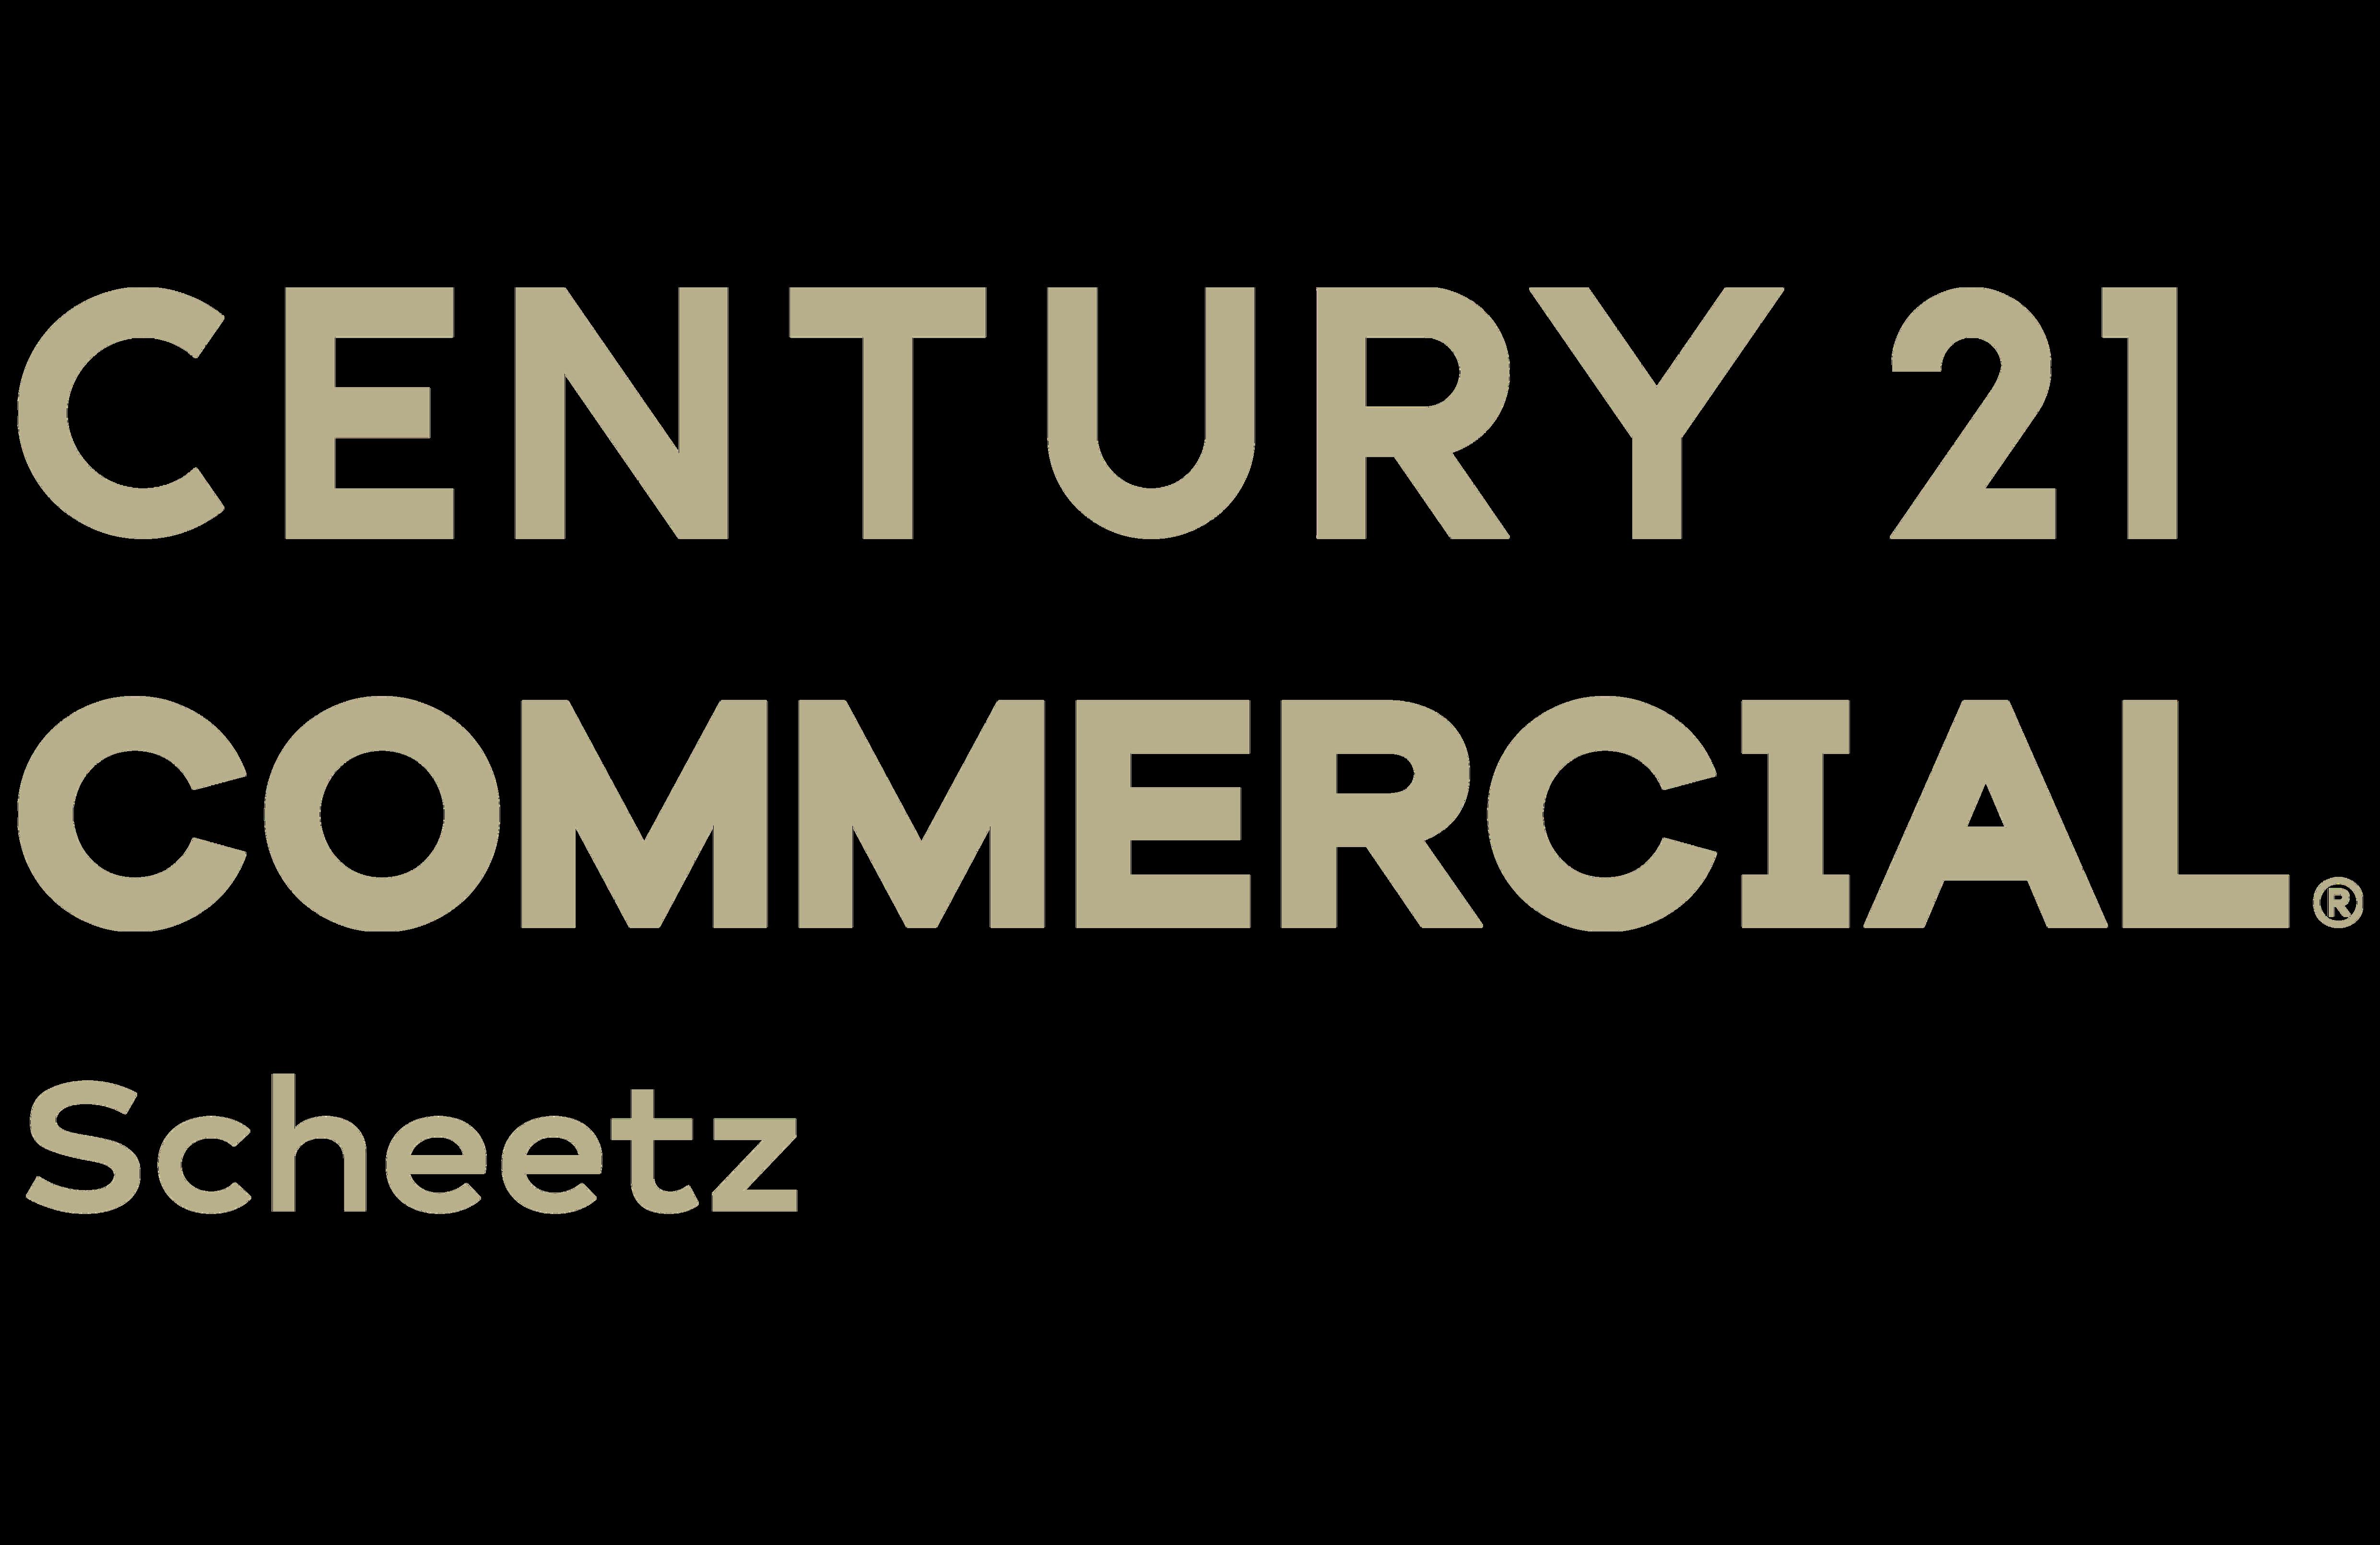 Thomas Kiritsis II of CENTURY 21 Scheetz logo